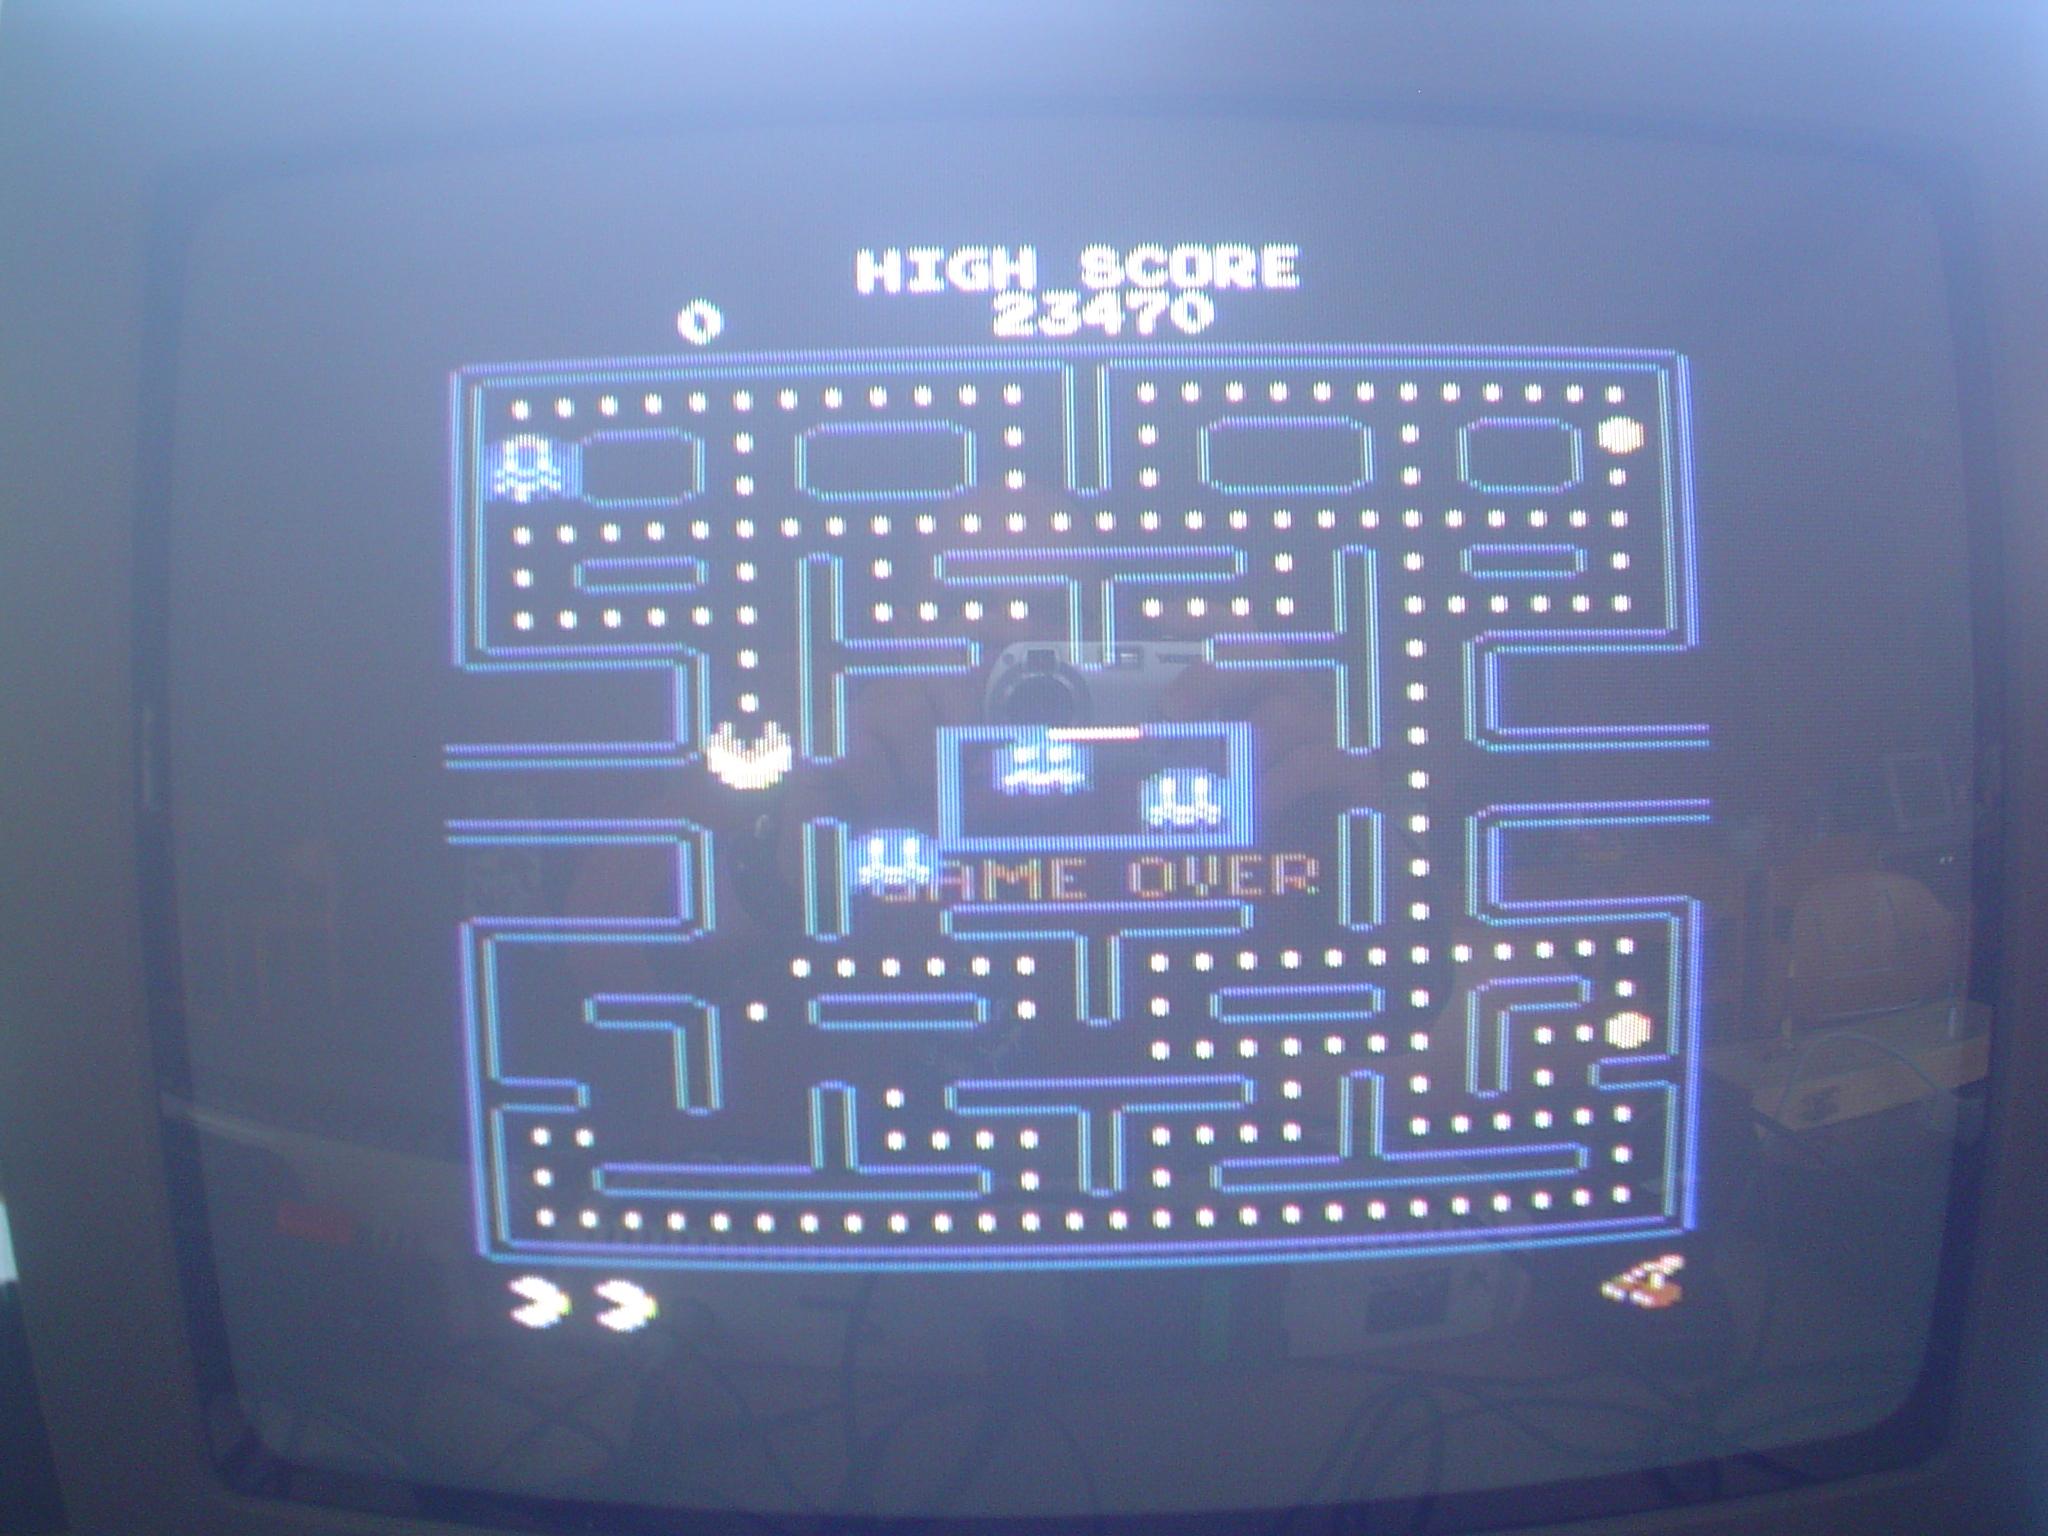 Pac-Man Arcade 23,470 points